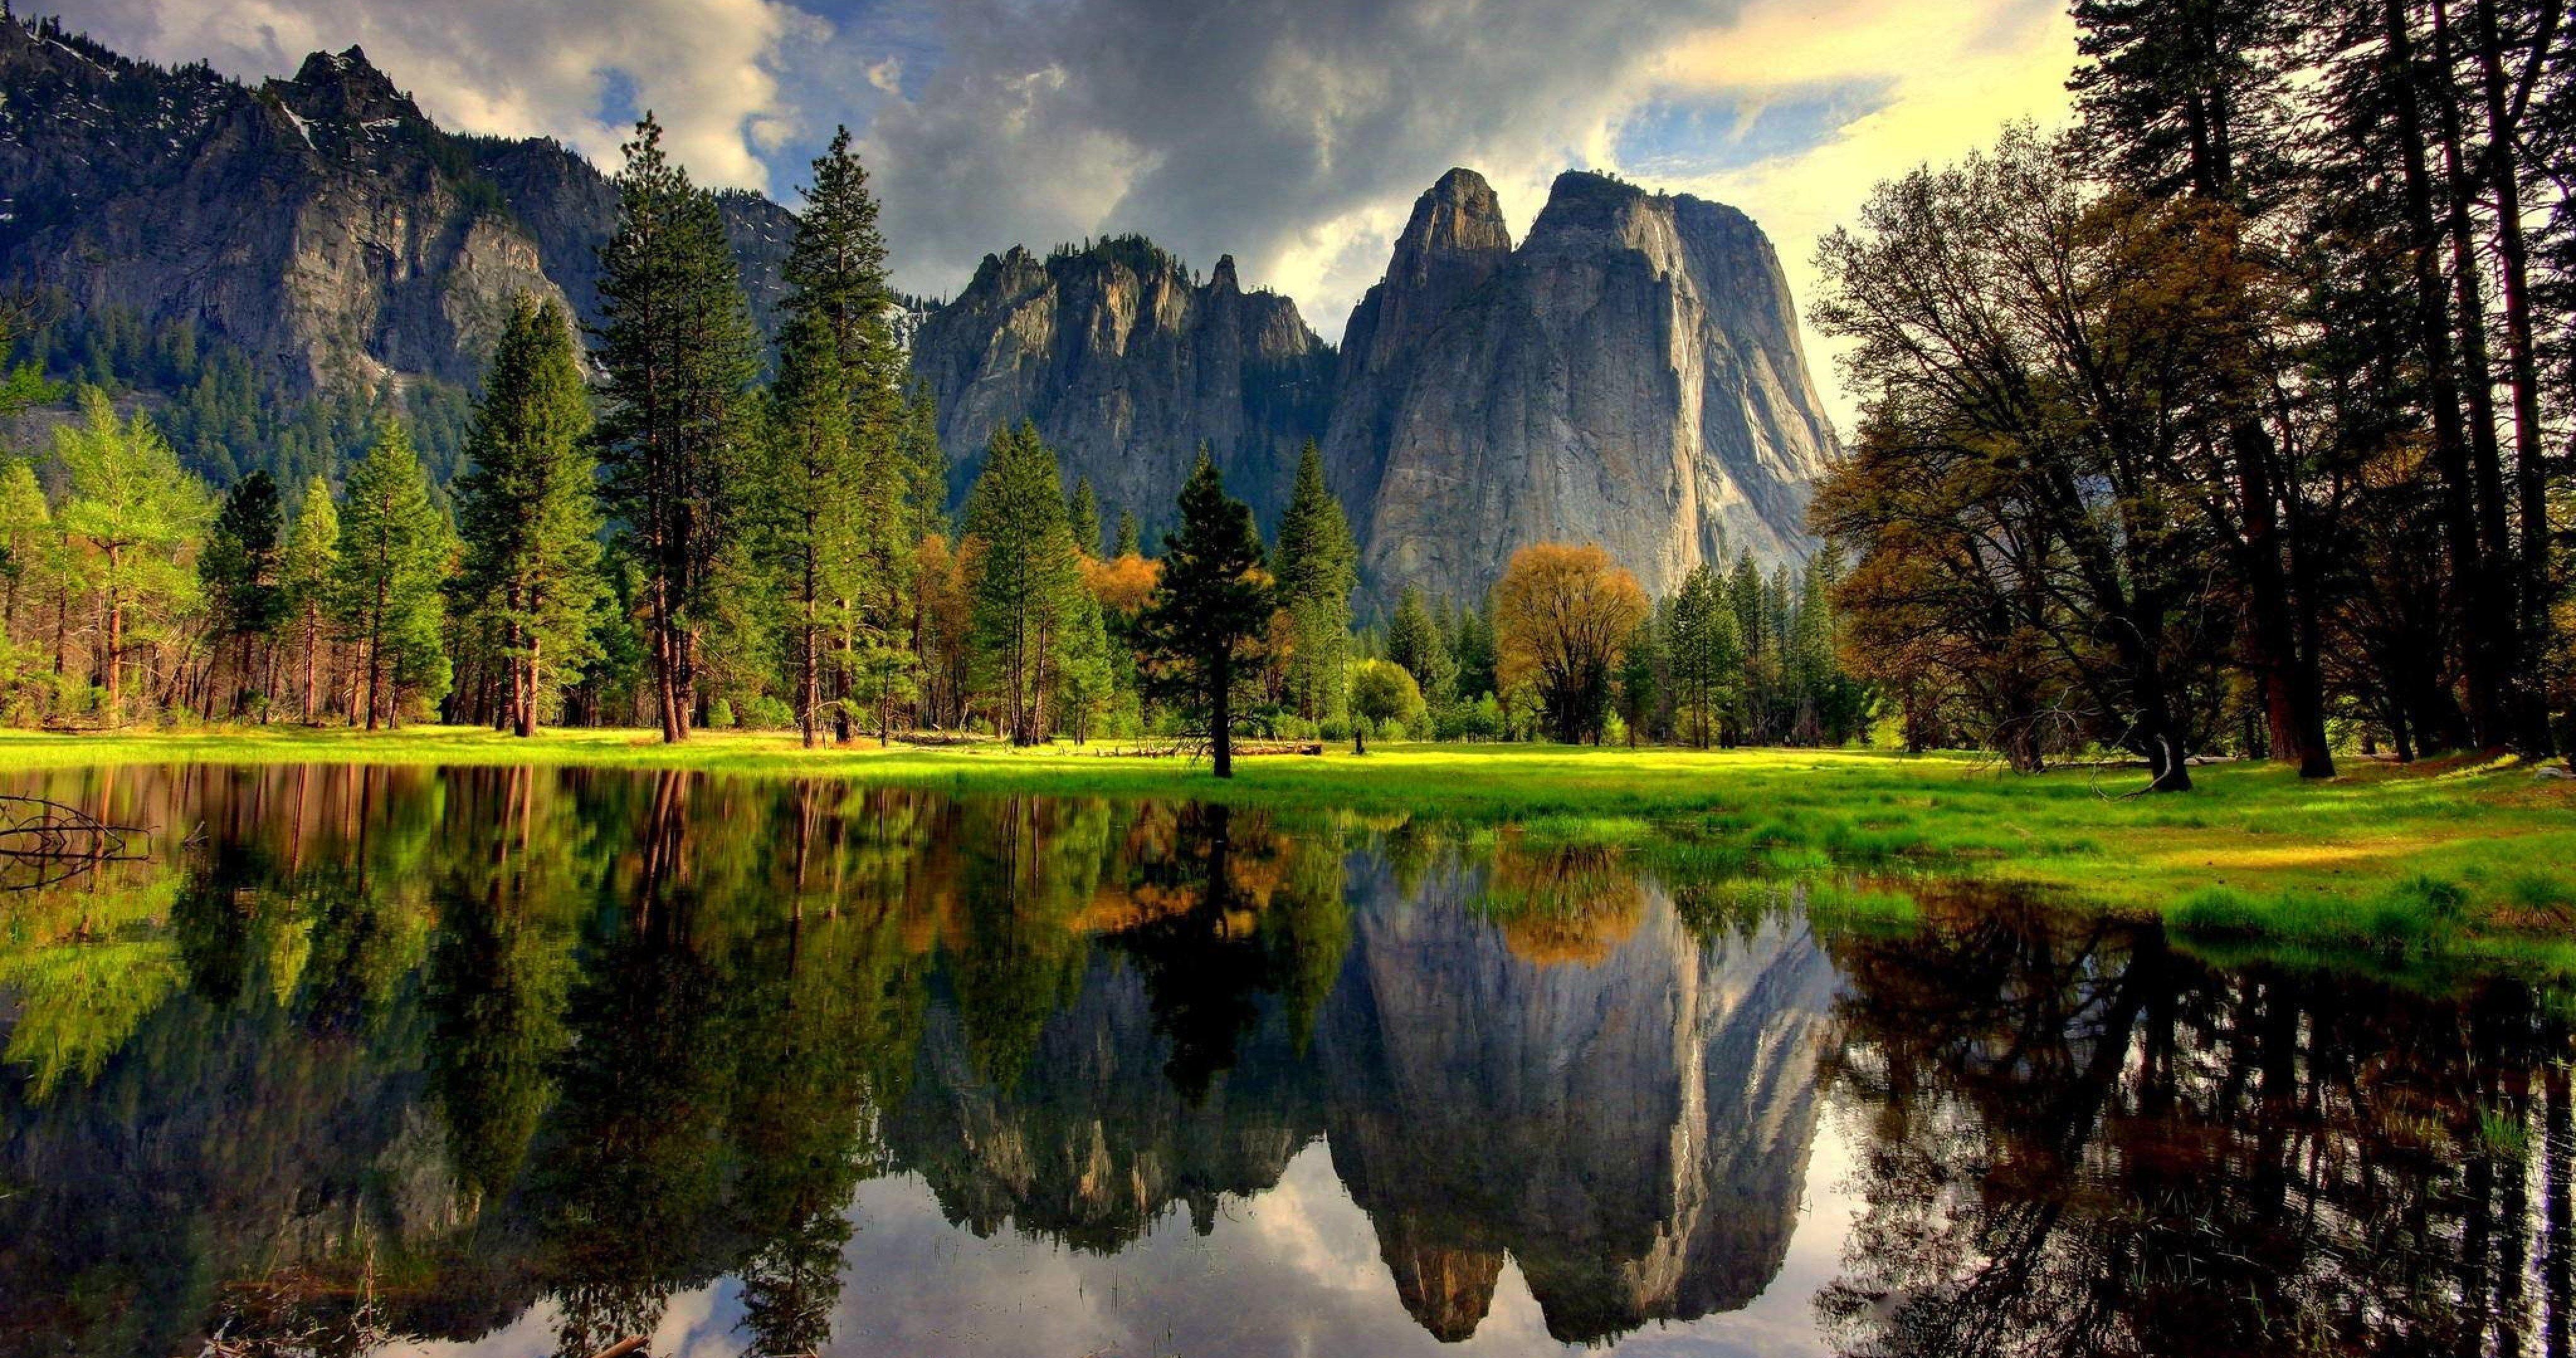 Havasu Falls Wallpaper Yosemite National Park 24 4k Ultra Hd Wallpaper